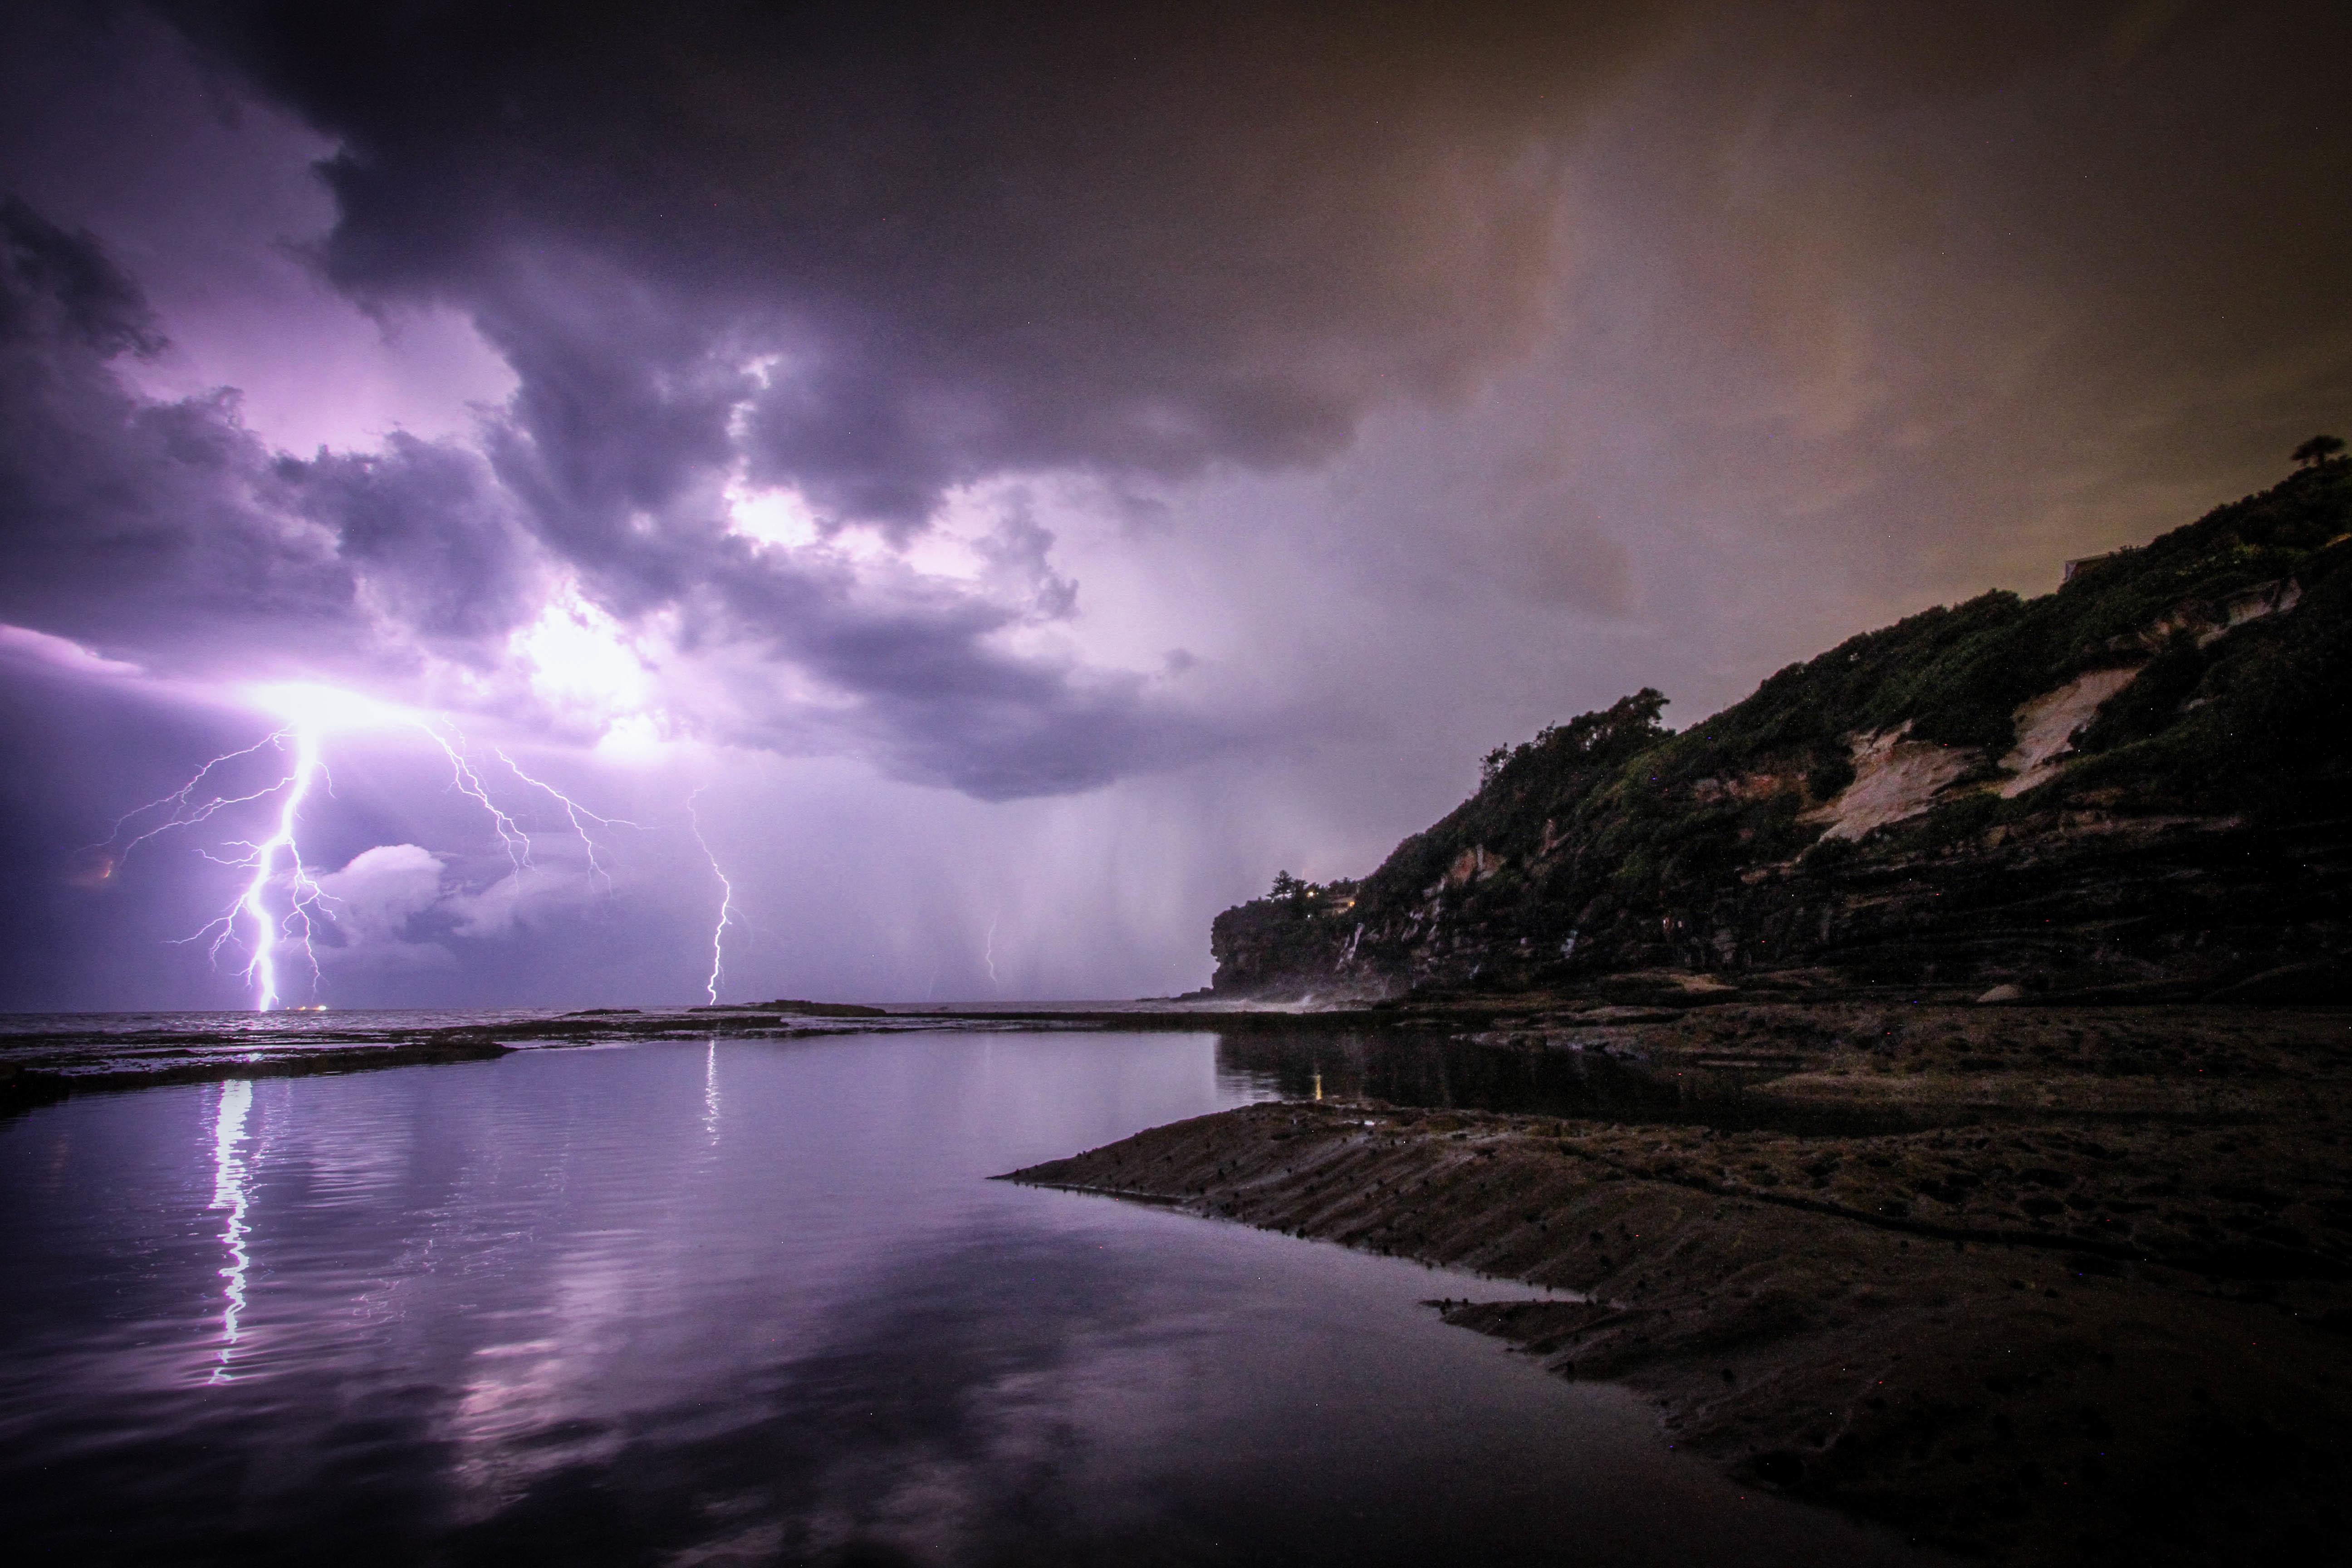 Lightning, Cloud, Cloudy, Landscape, Light, HQ Photo